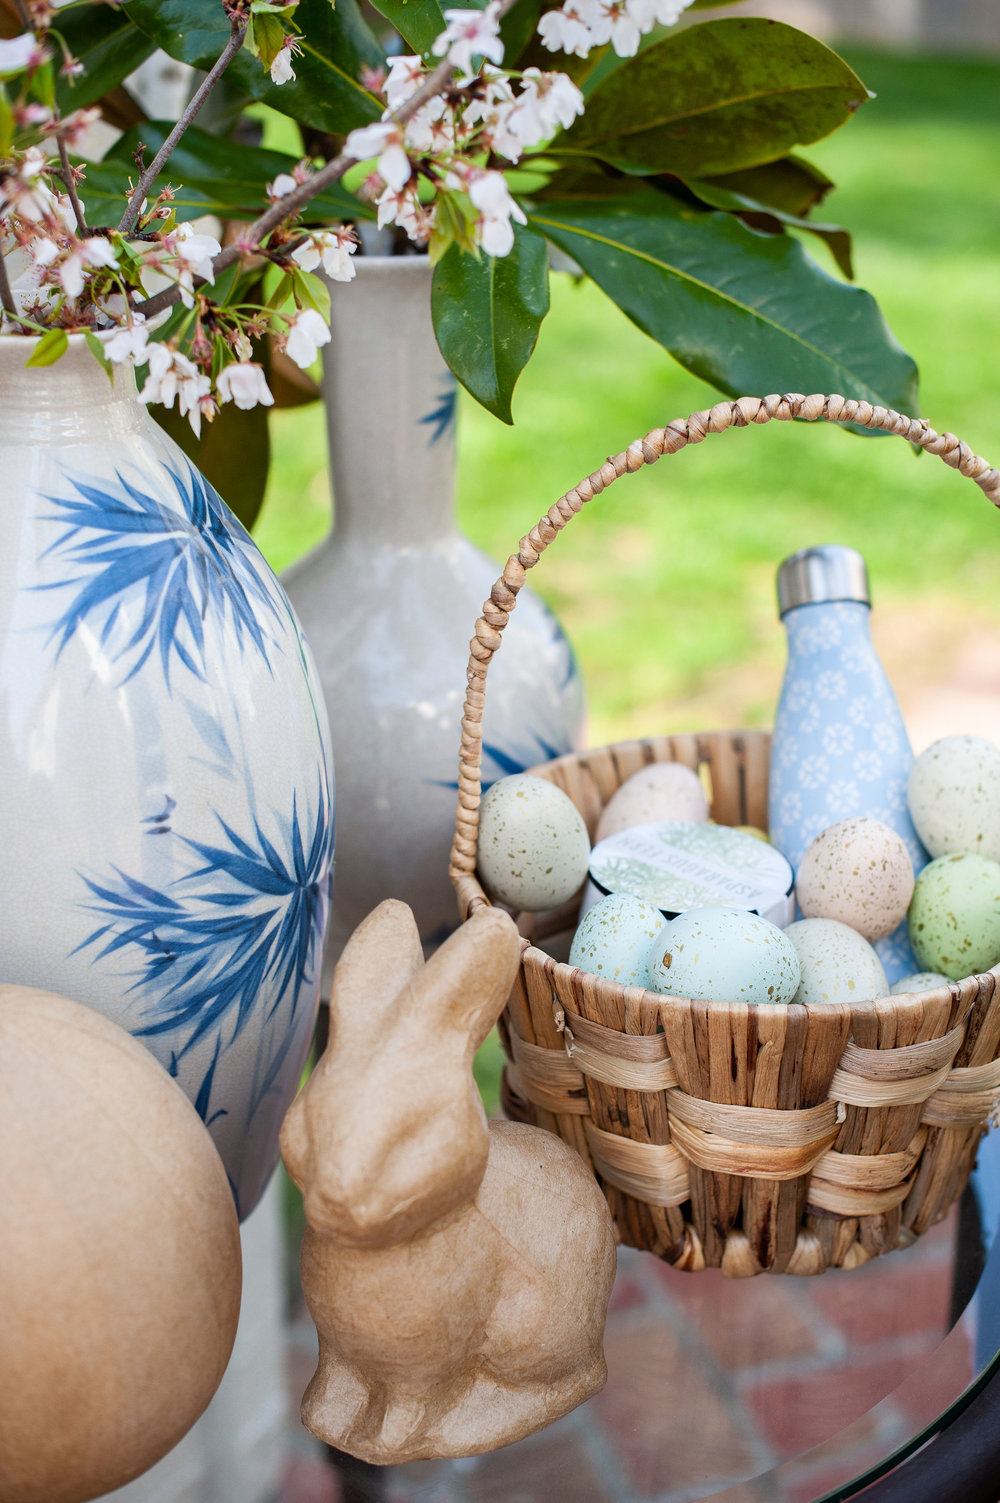 EasterBrunch_CedarLane_TSG-29.jpg